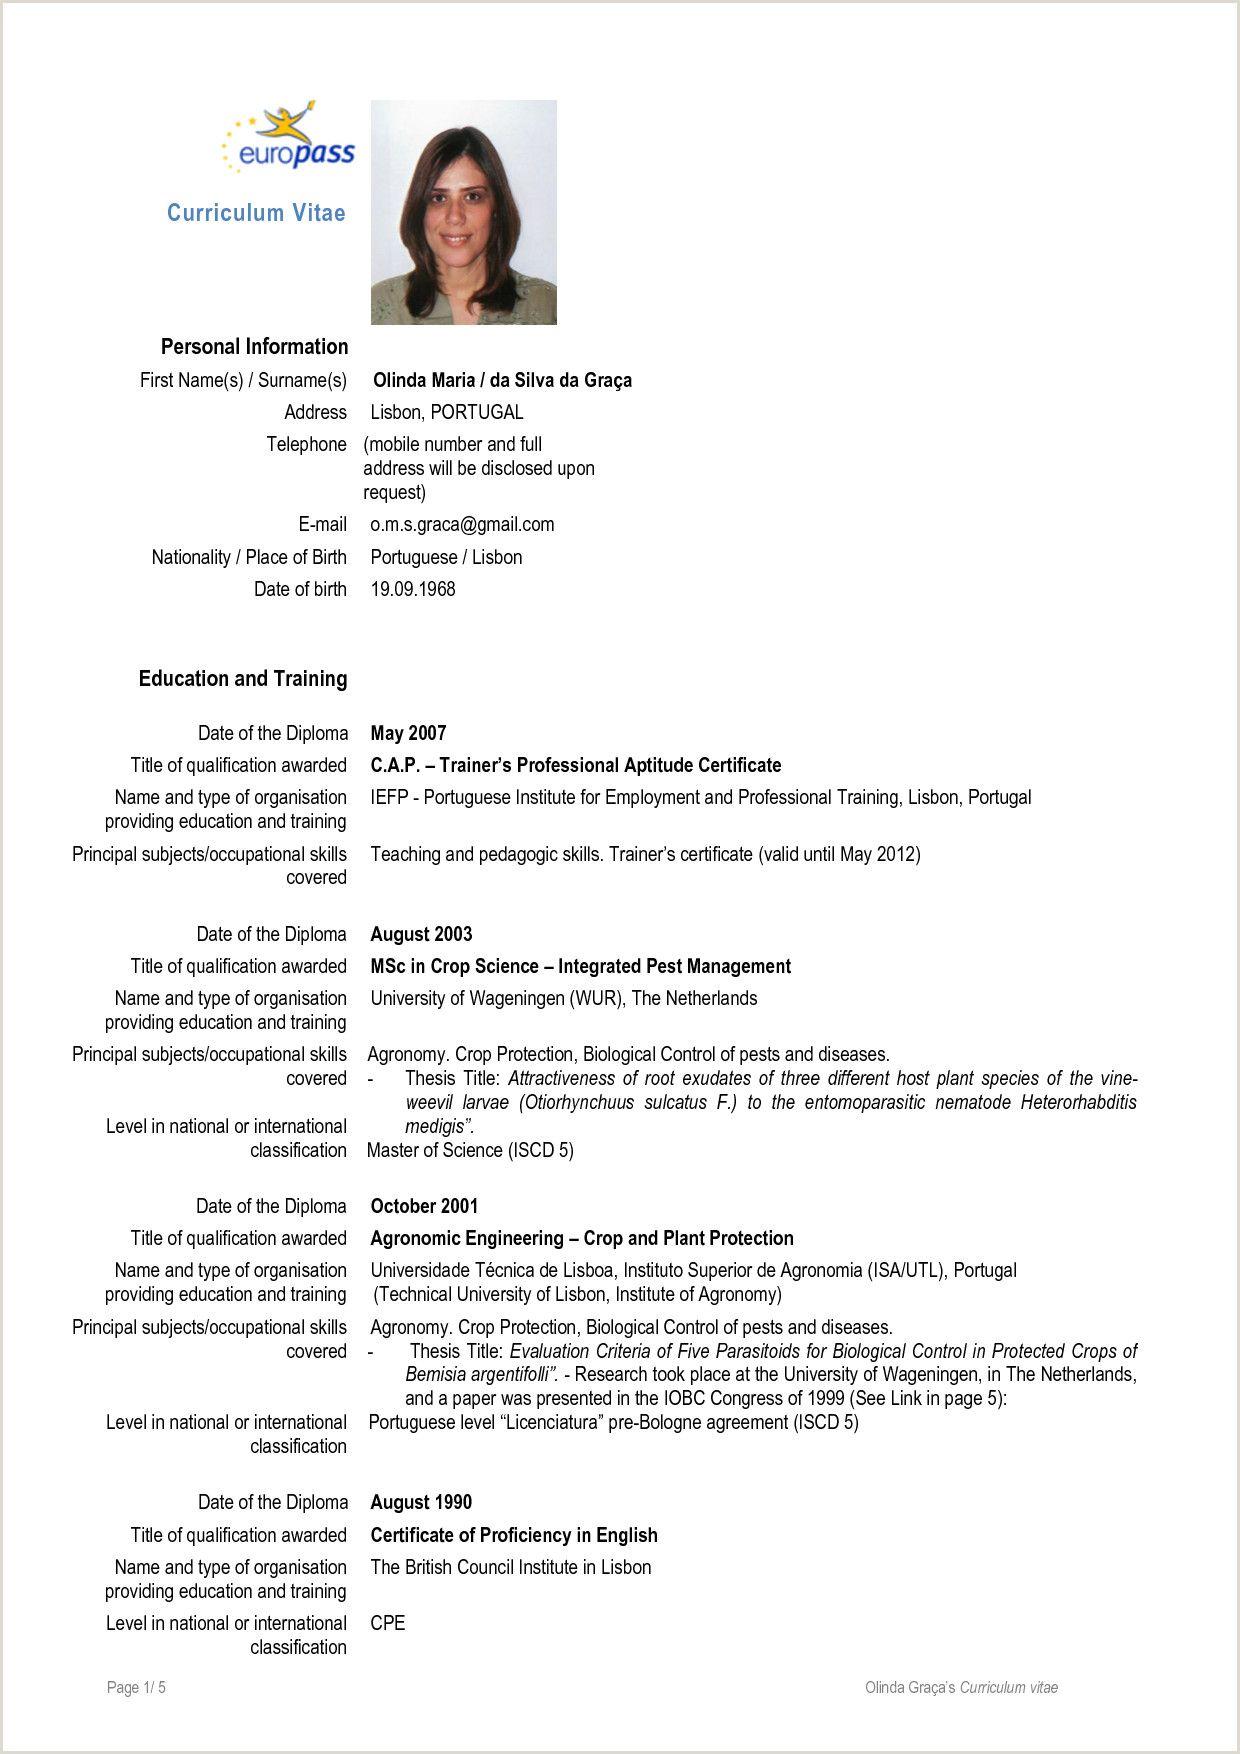 Europass Cv Format In Word Nel 2020 Scuola